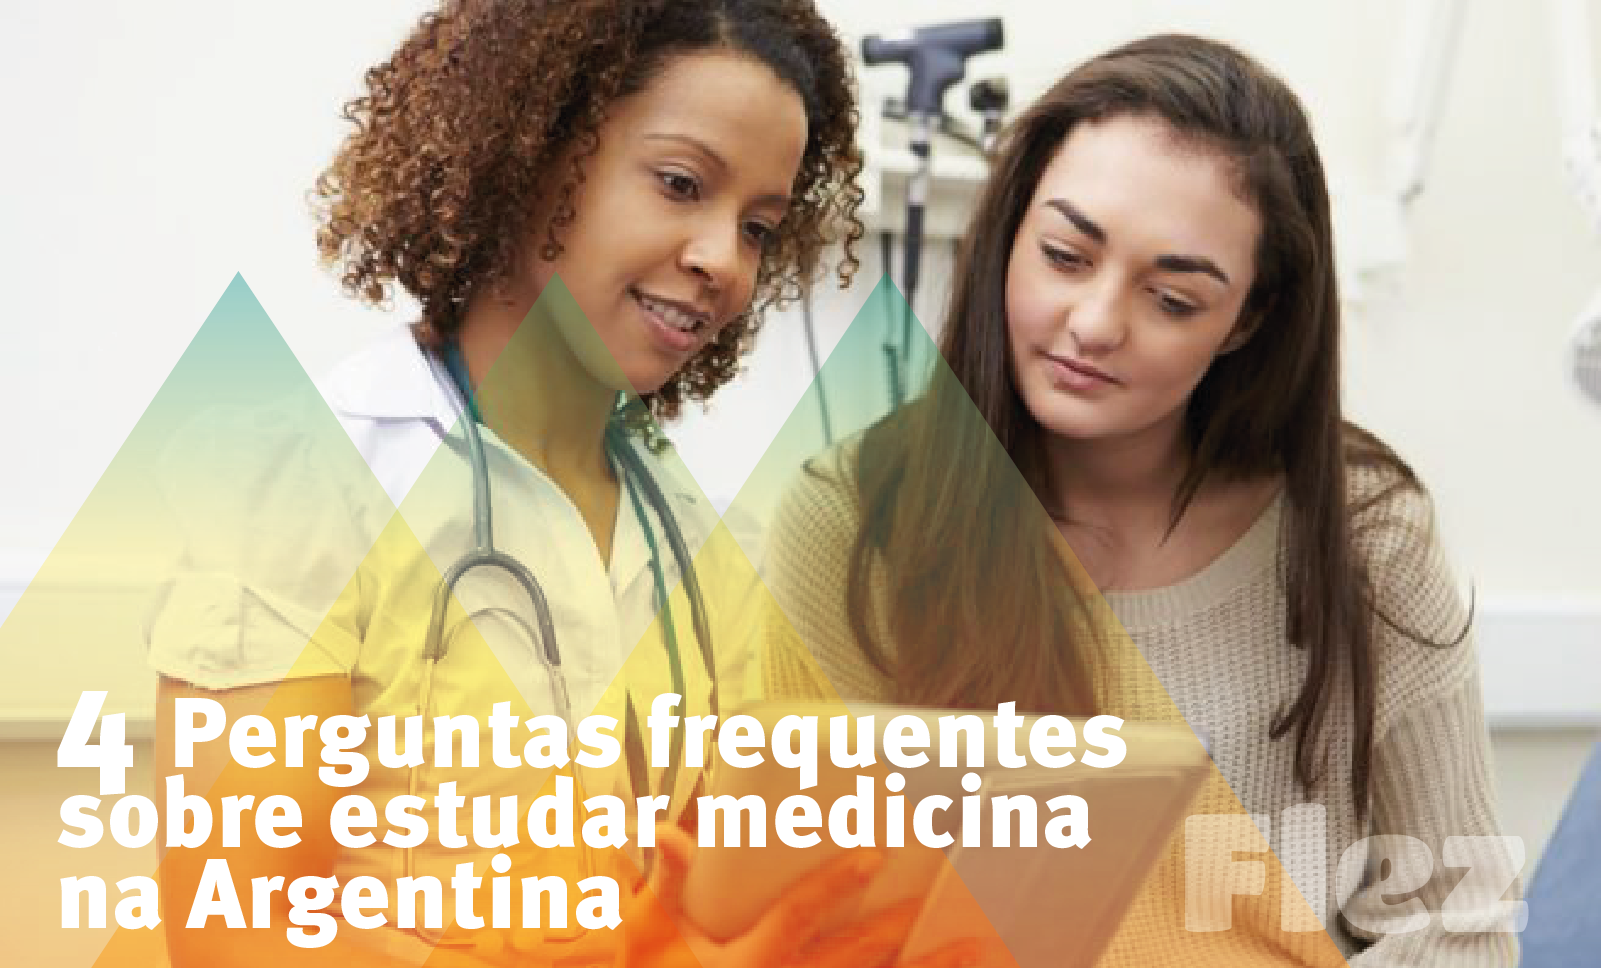 4 perguntas frequentes sobre estudar medicina na Argentina